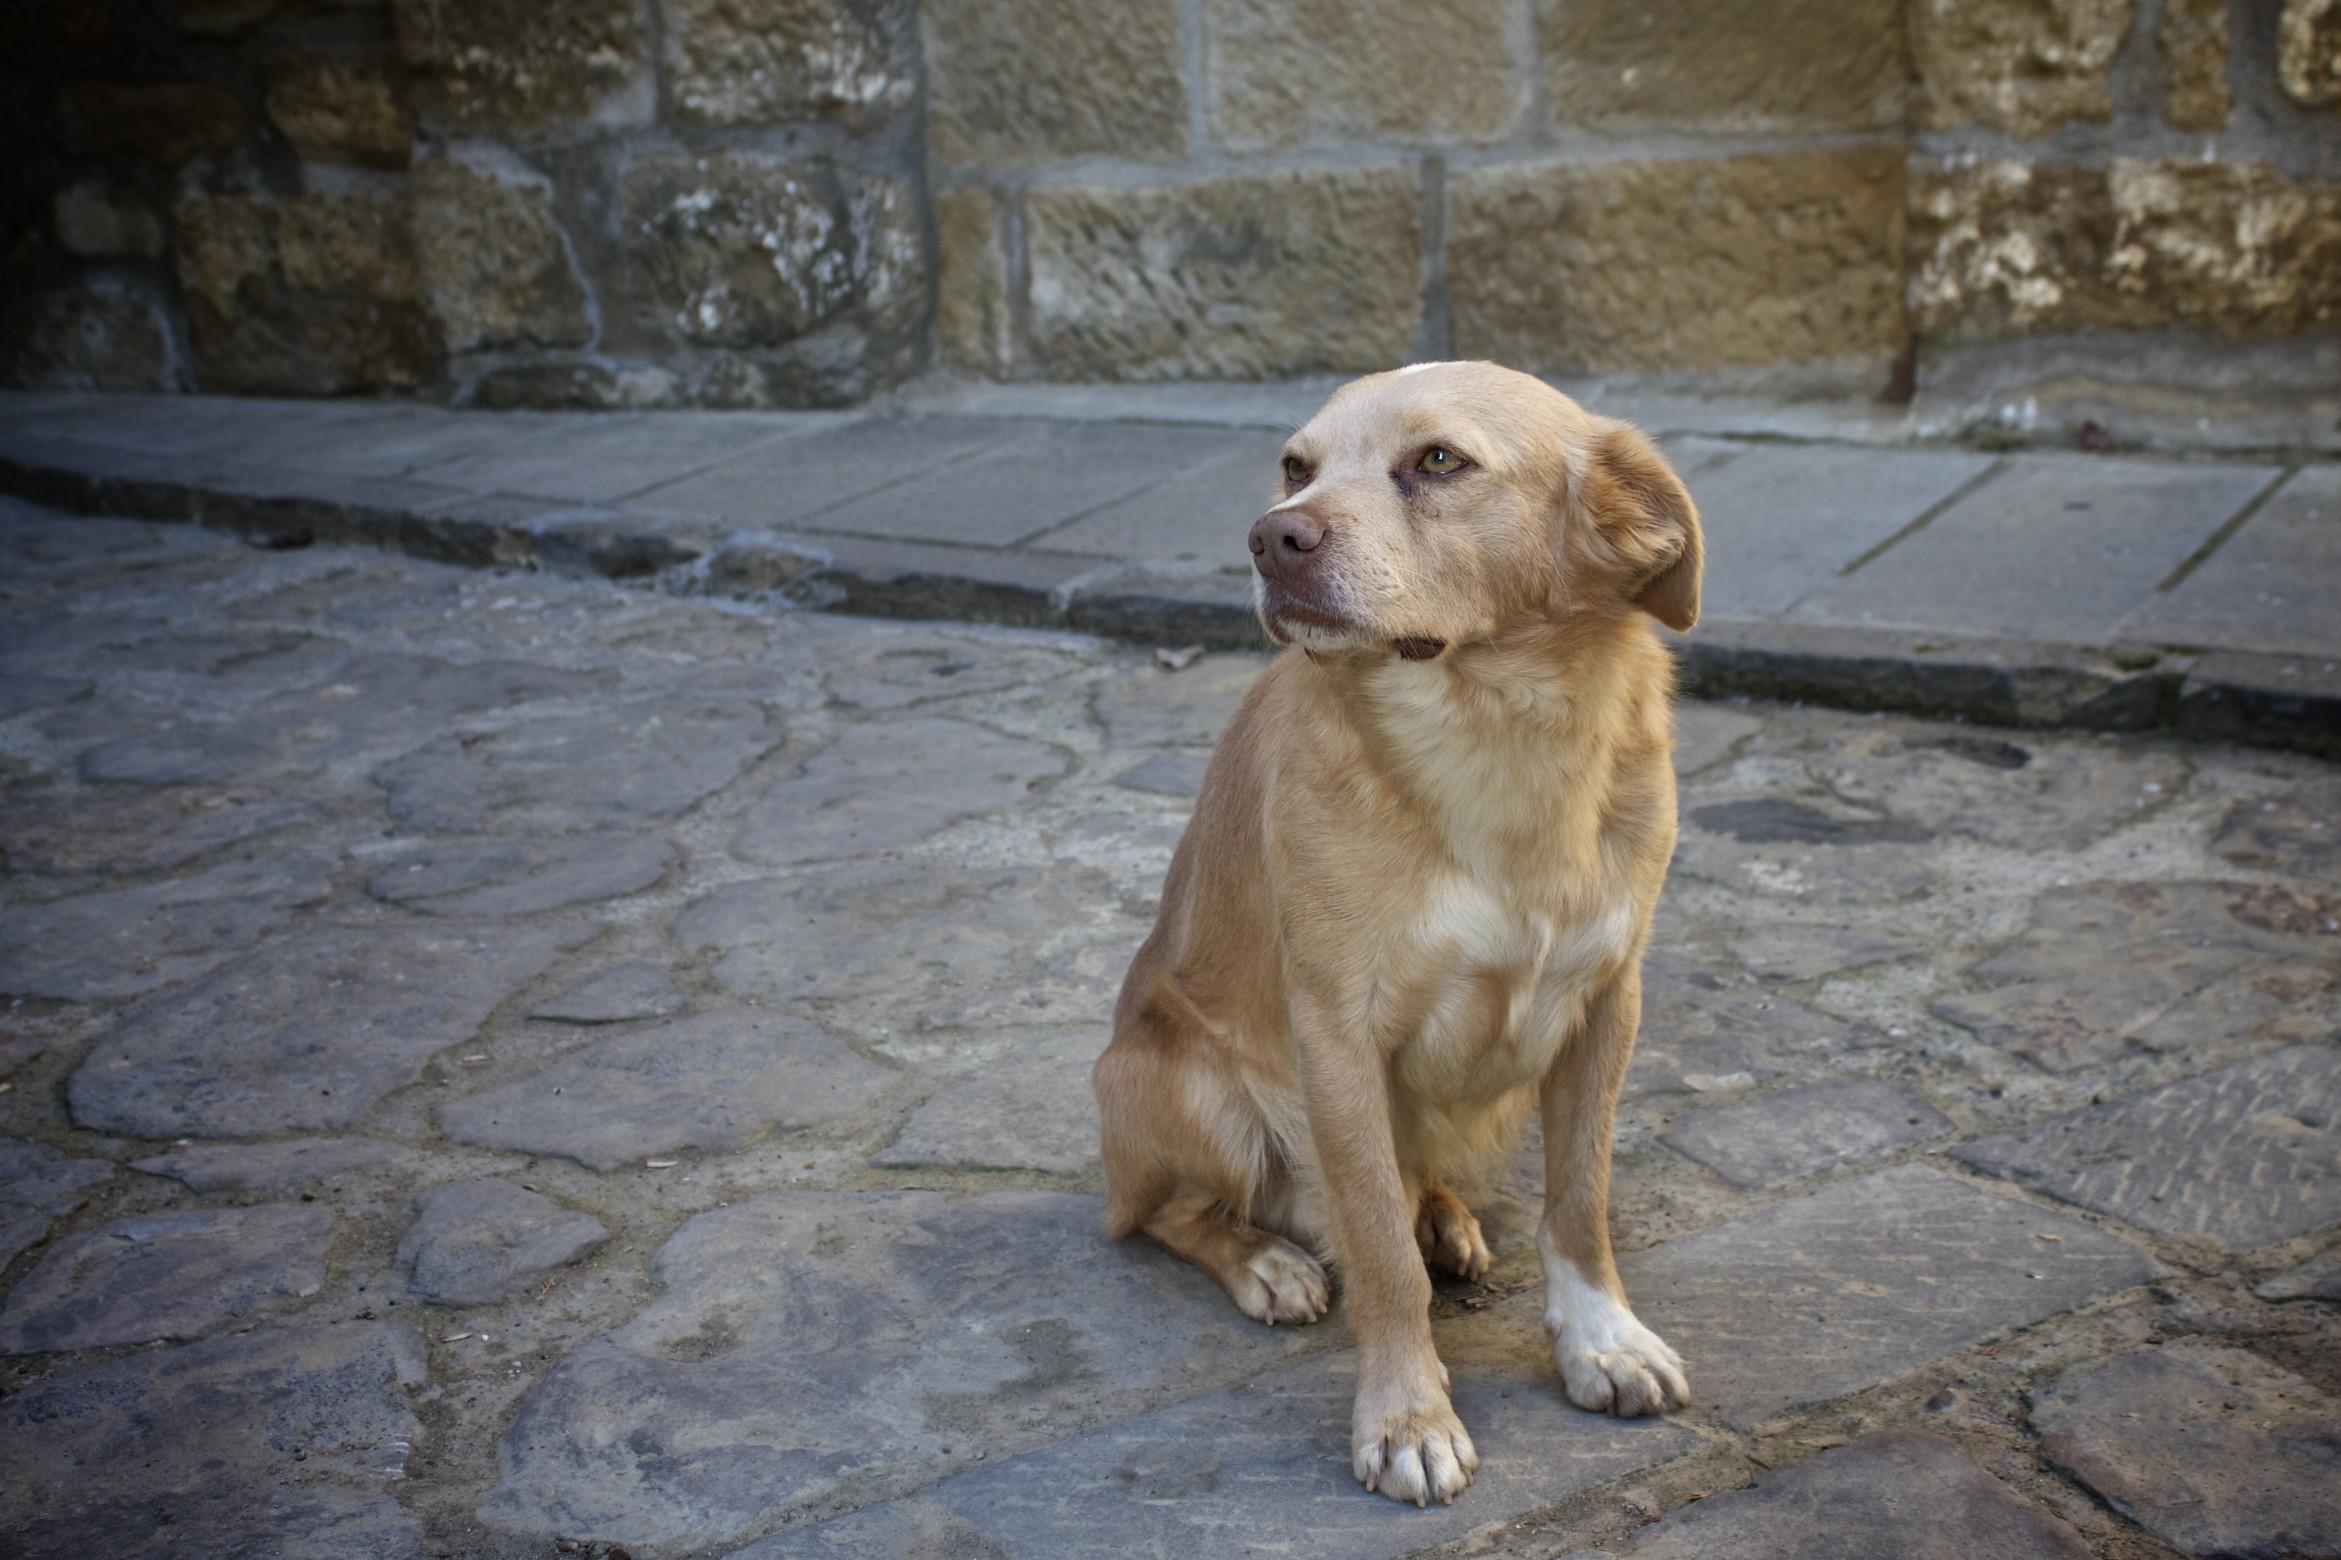 Dog Stopped Having Seizures But Keeps Peeing Everywhere